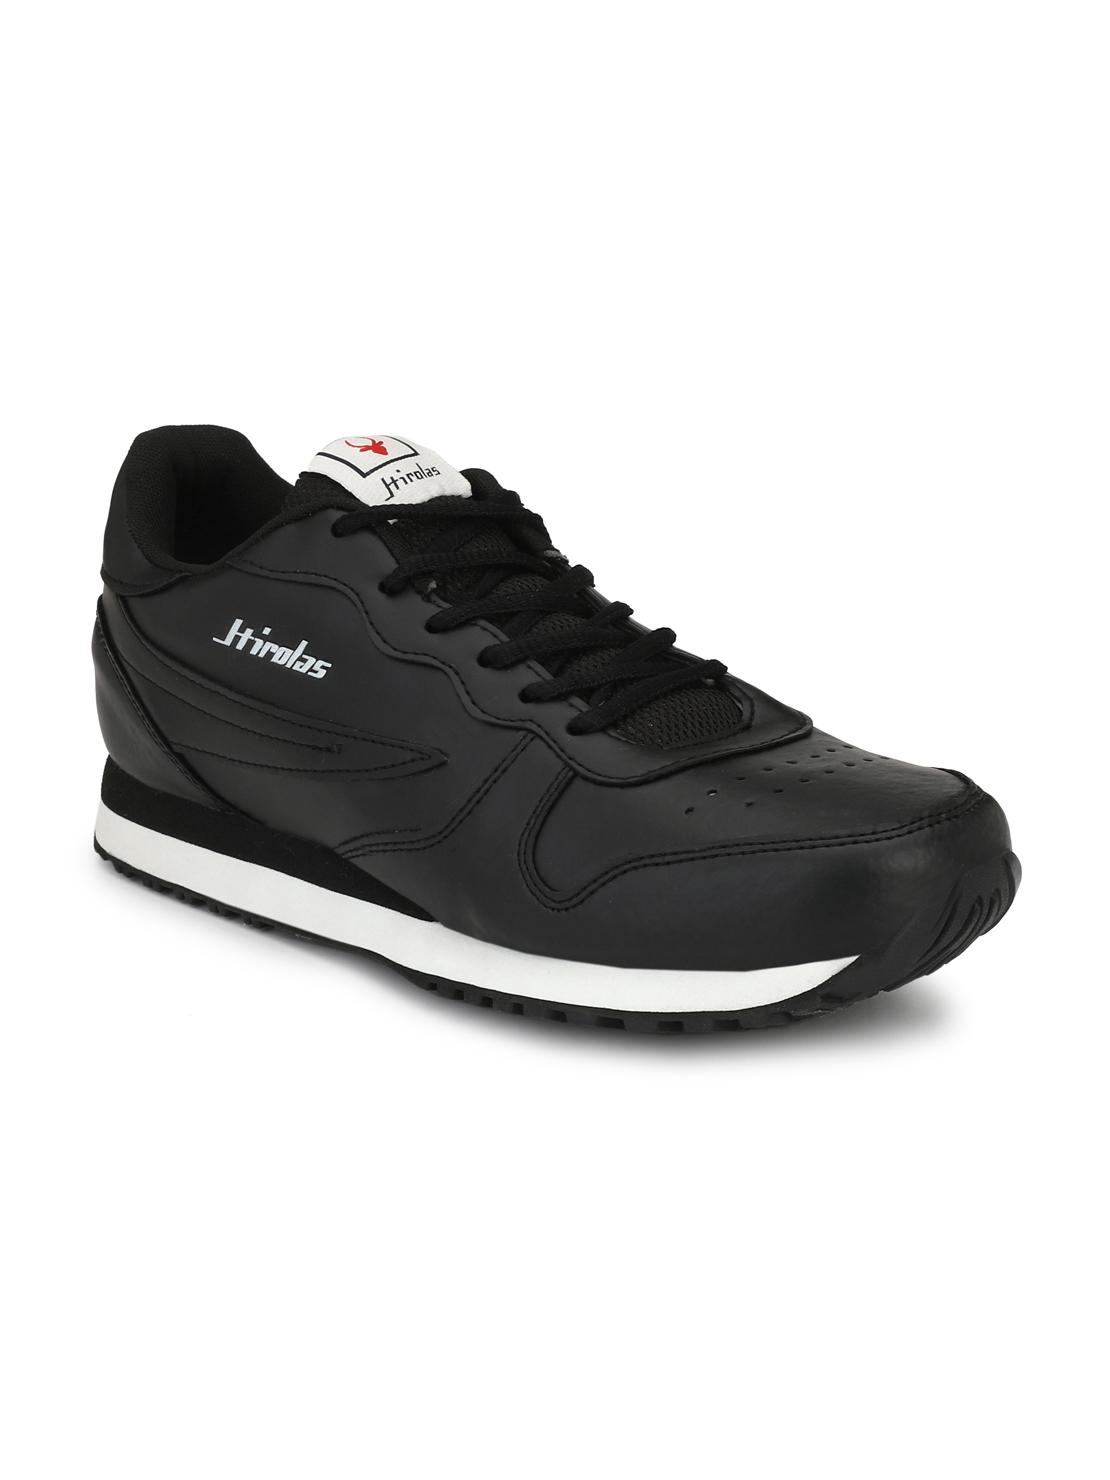 Hirolas   Hirolas Men's Multisport Jogger Shoes- White